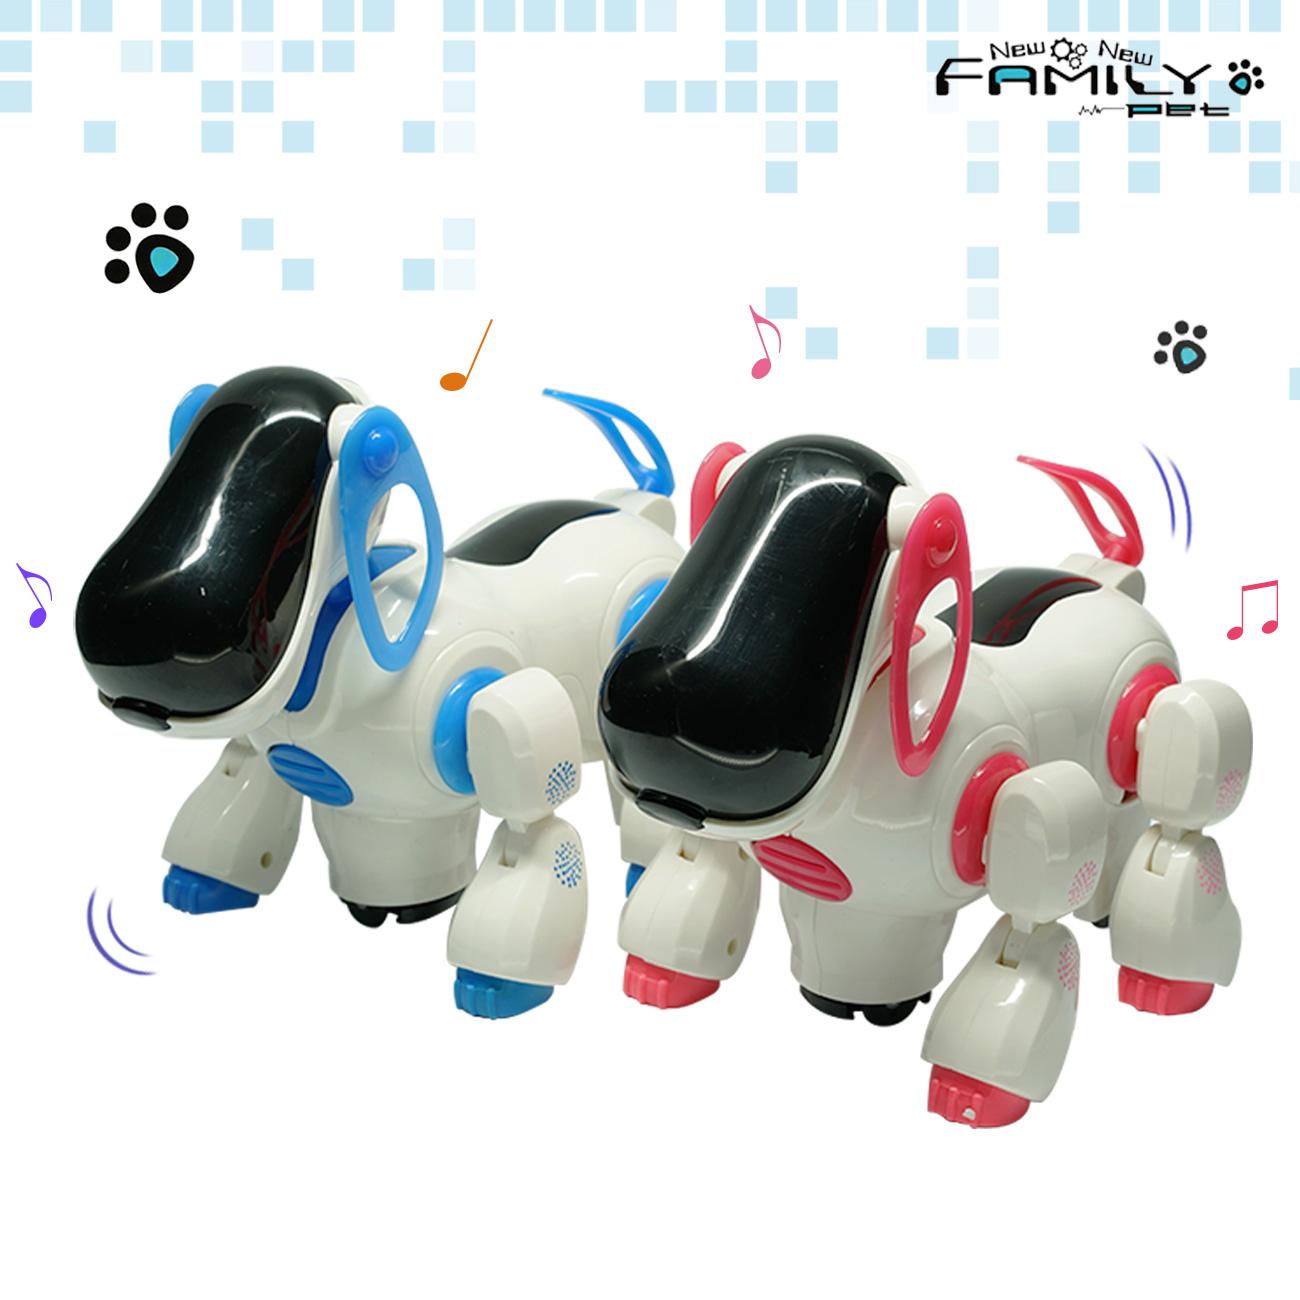 LED 사이버 로봇 멜로디 움직이는 강아지 장난감 어린이 아동 유아 교구 게임, 블루